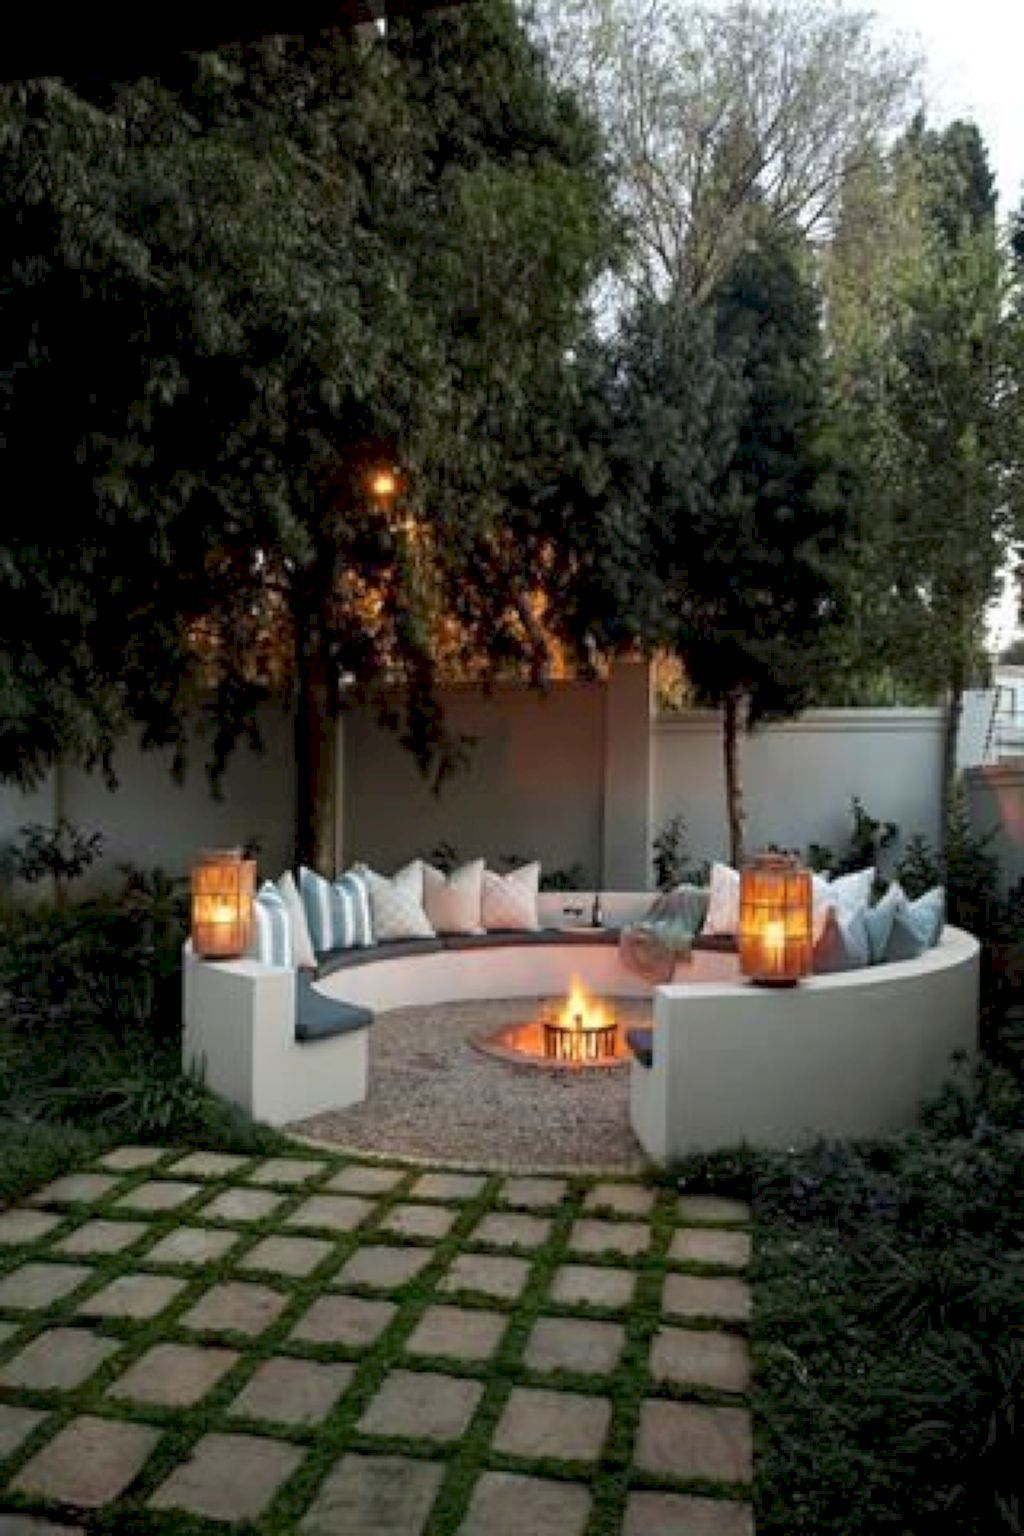 The Best Romantic Backyard Decorating Ideas 06